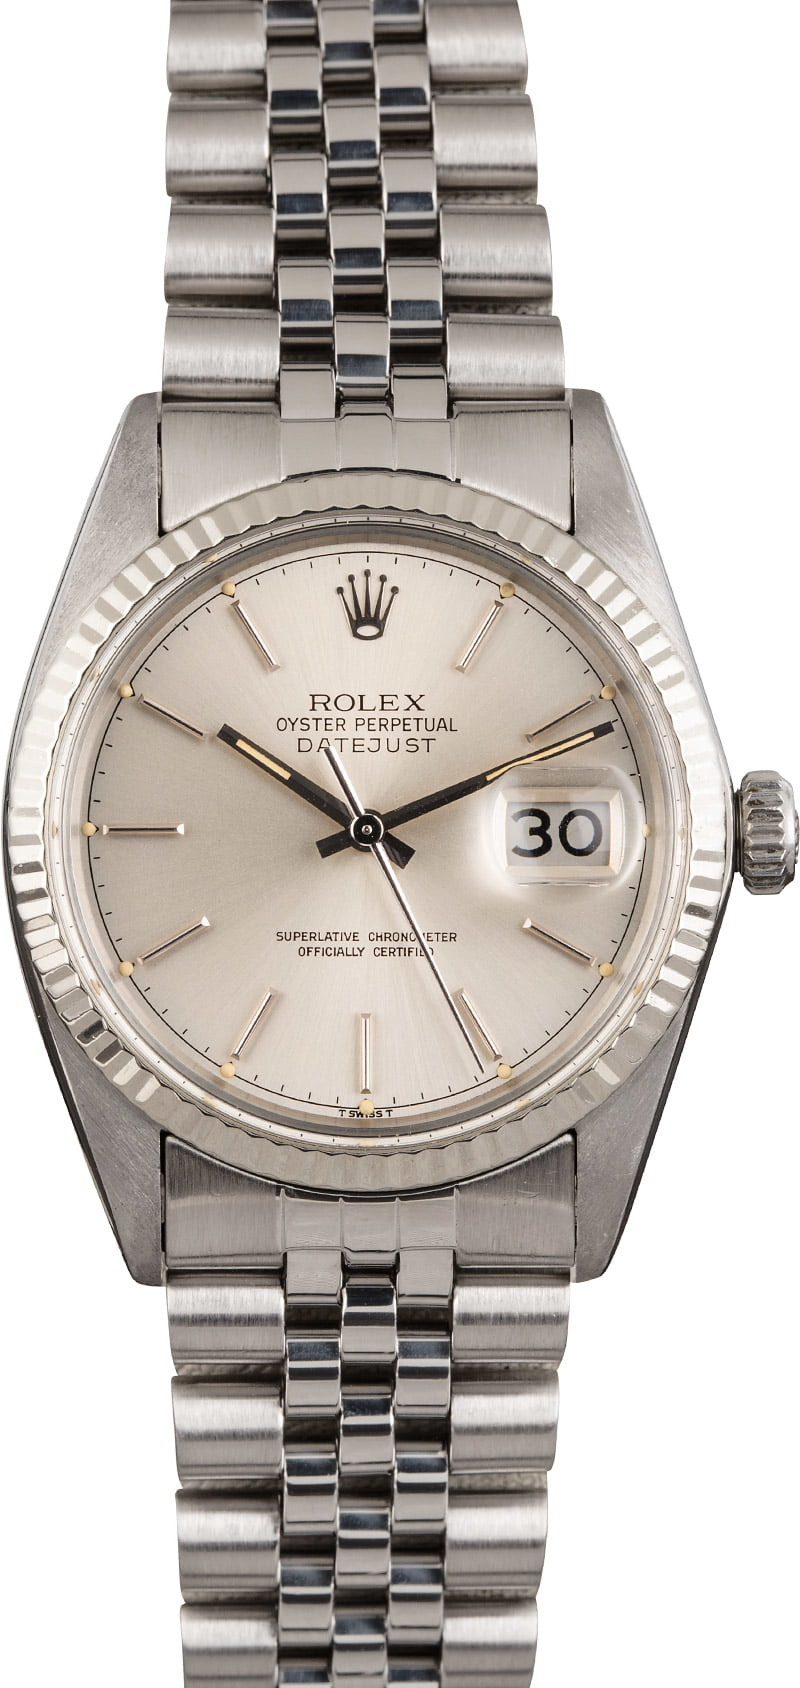 Buy Used Rolex Datejust 16014 | Bob's Watches - Sku: 125338 x